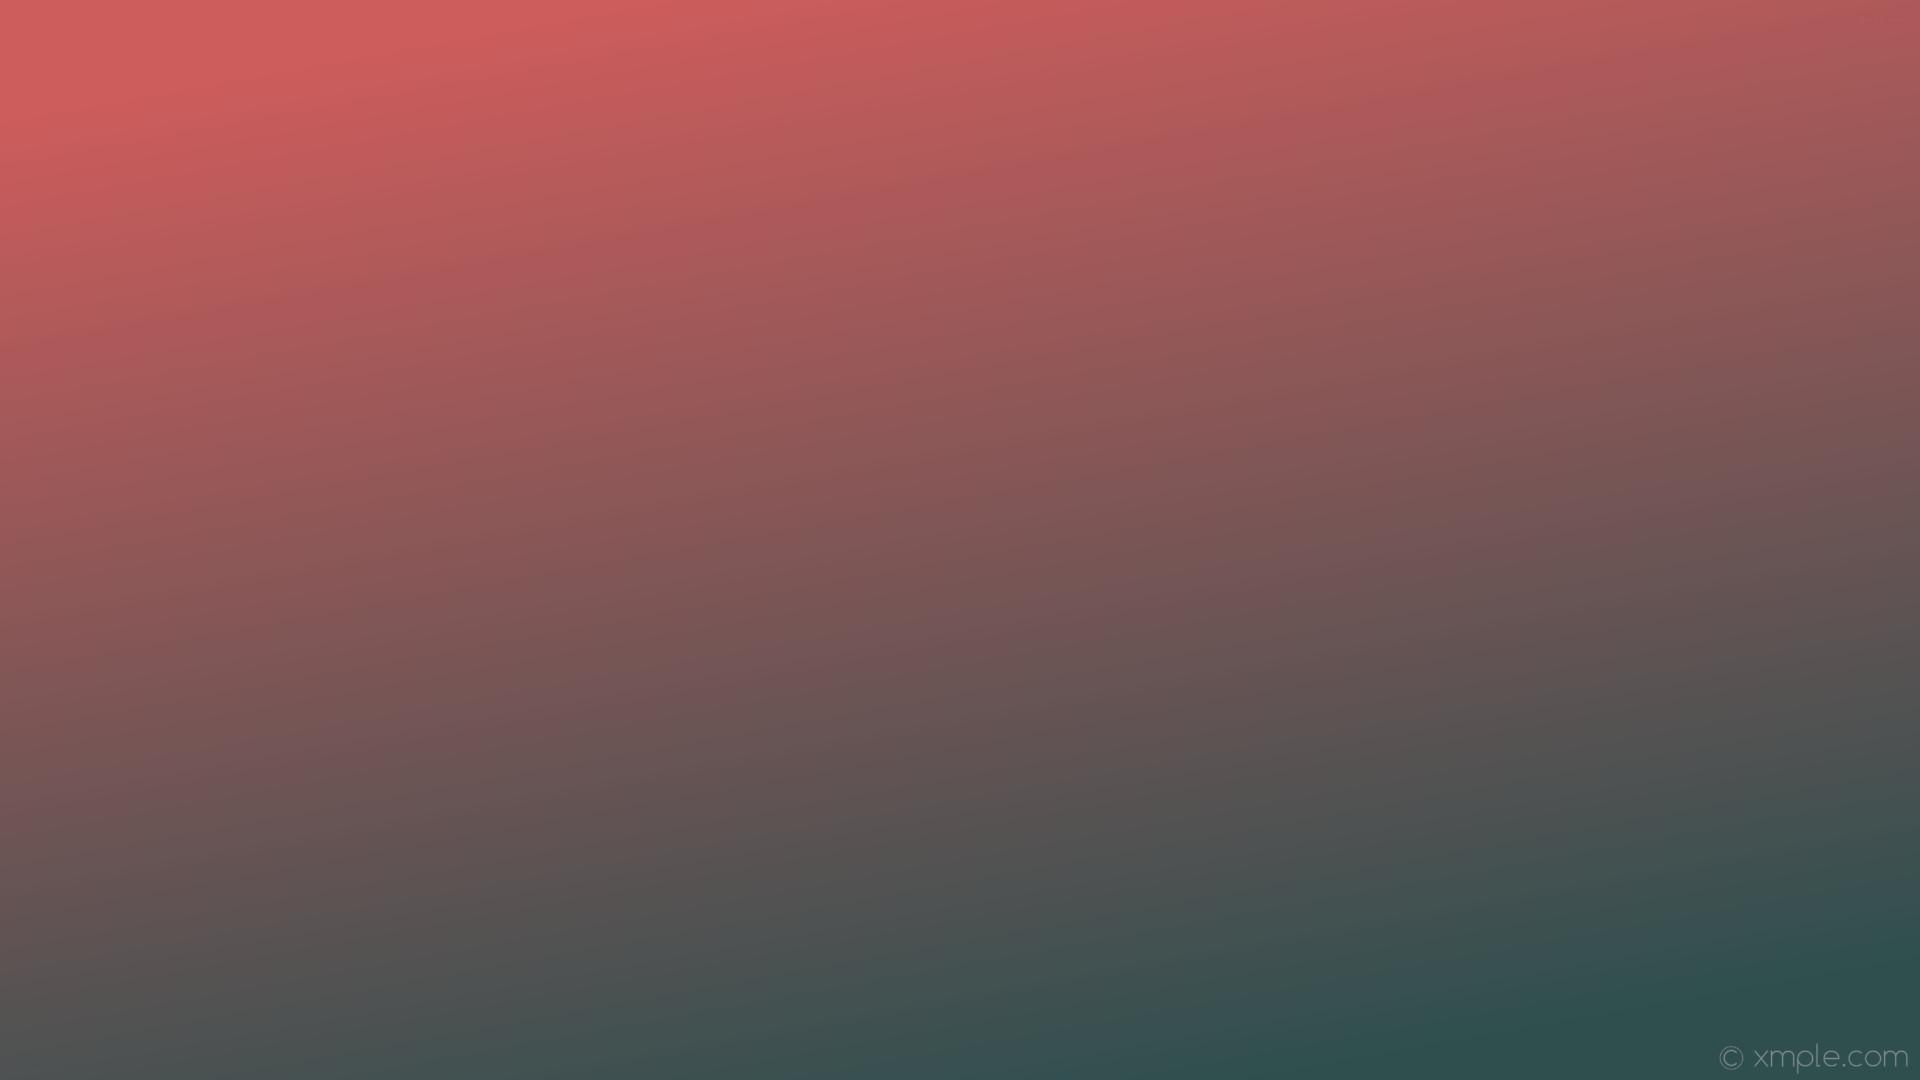 wallpaper linear red grey gradient indian red dark slate gray #cd5c5c  #2f4f4f 120°